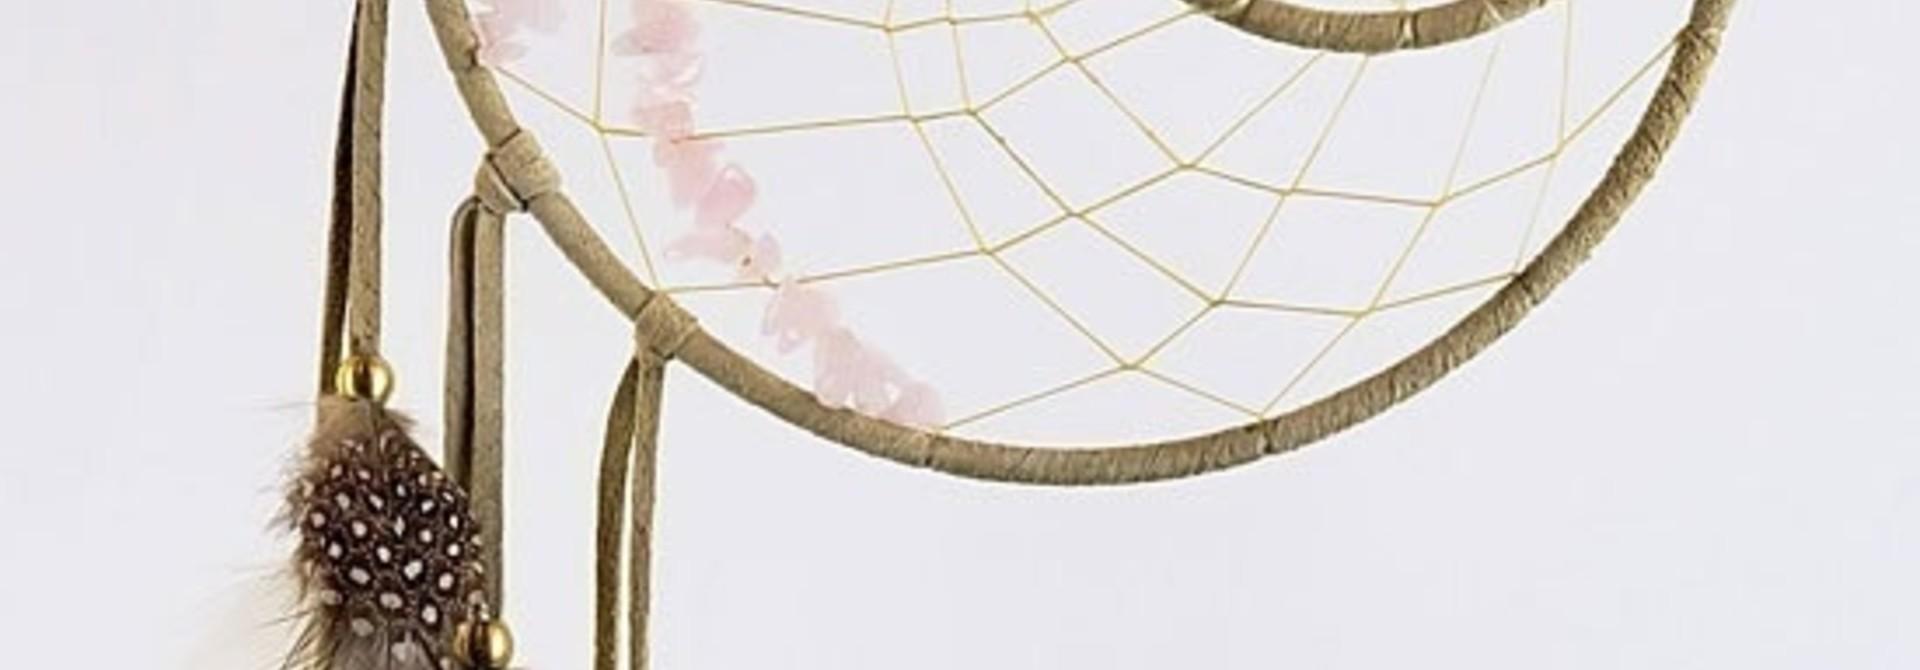 "6"" Energy Flow Dream Catcher detailed with Rose Quartz"